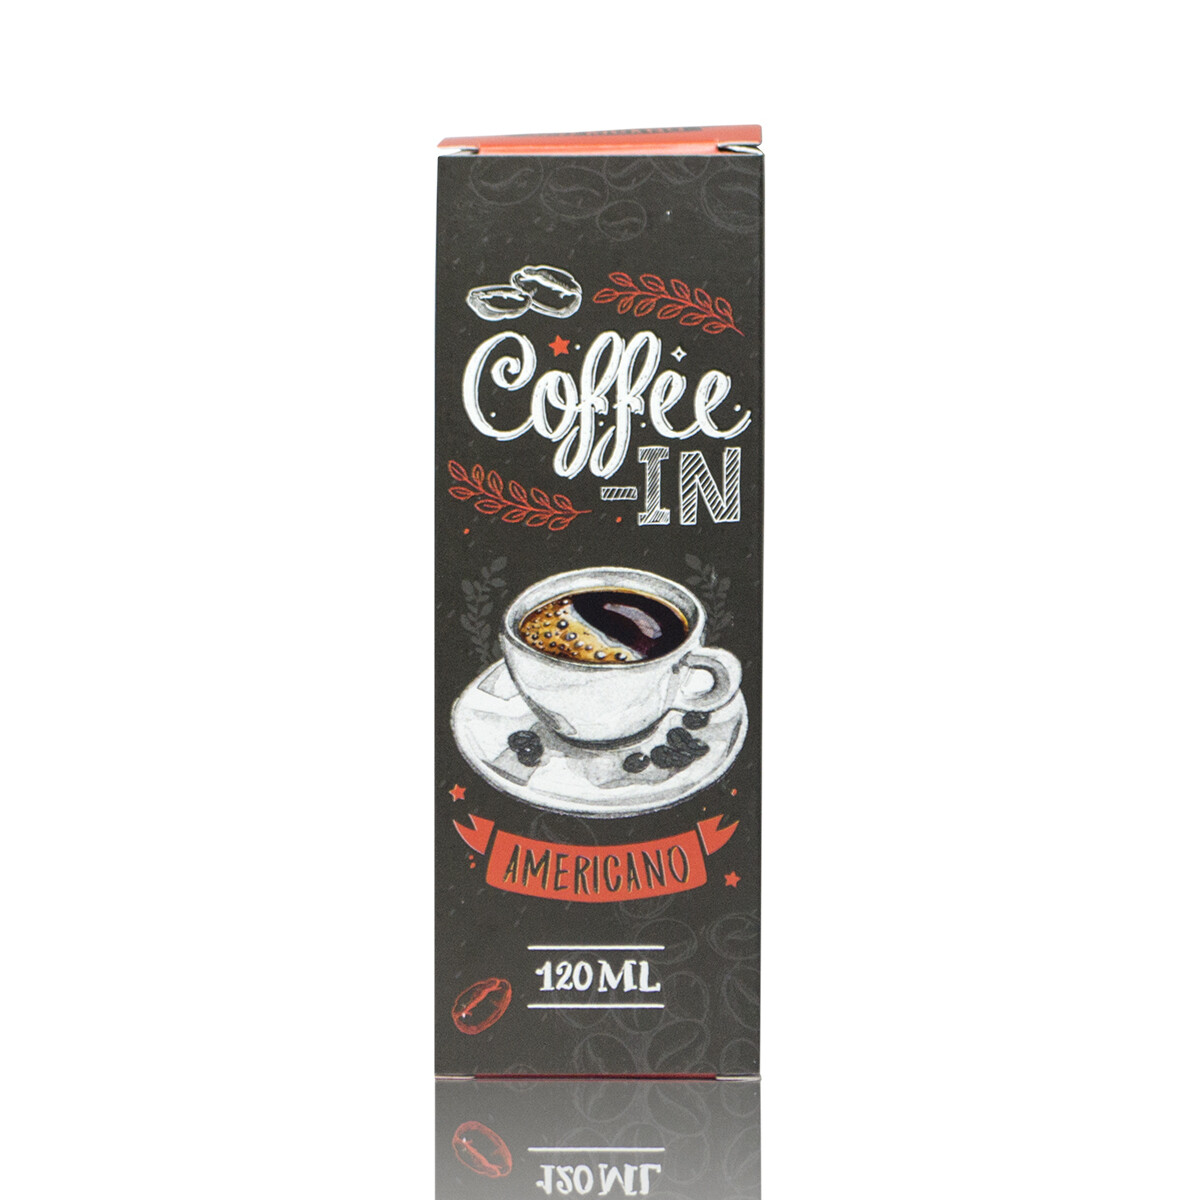 COFFE-IN SALT: AMERICANO 20MG